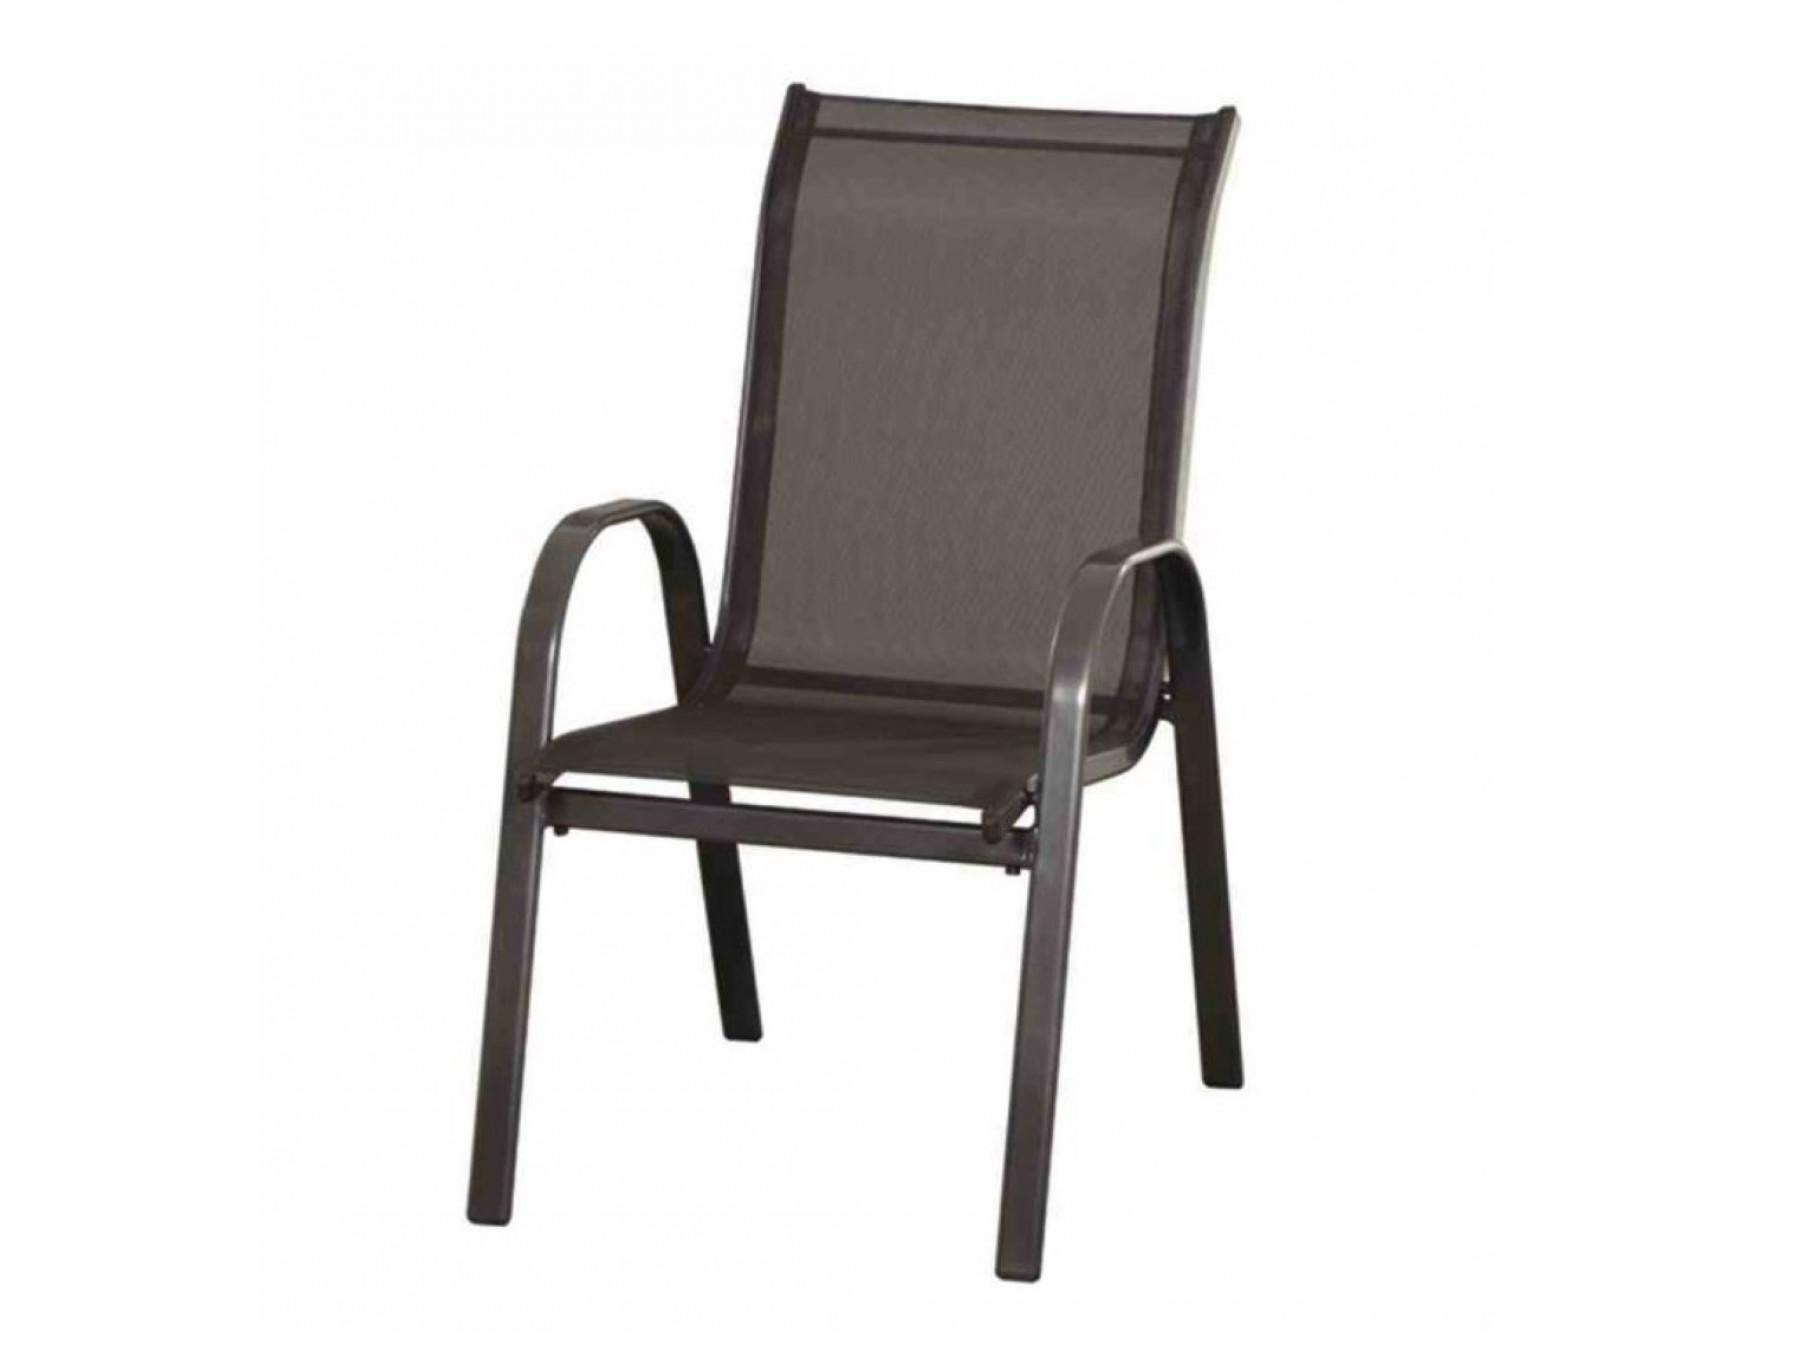 Stapelstuhl Gartenstühle Kunststoff